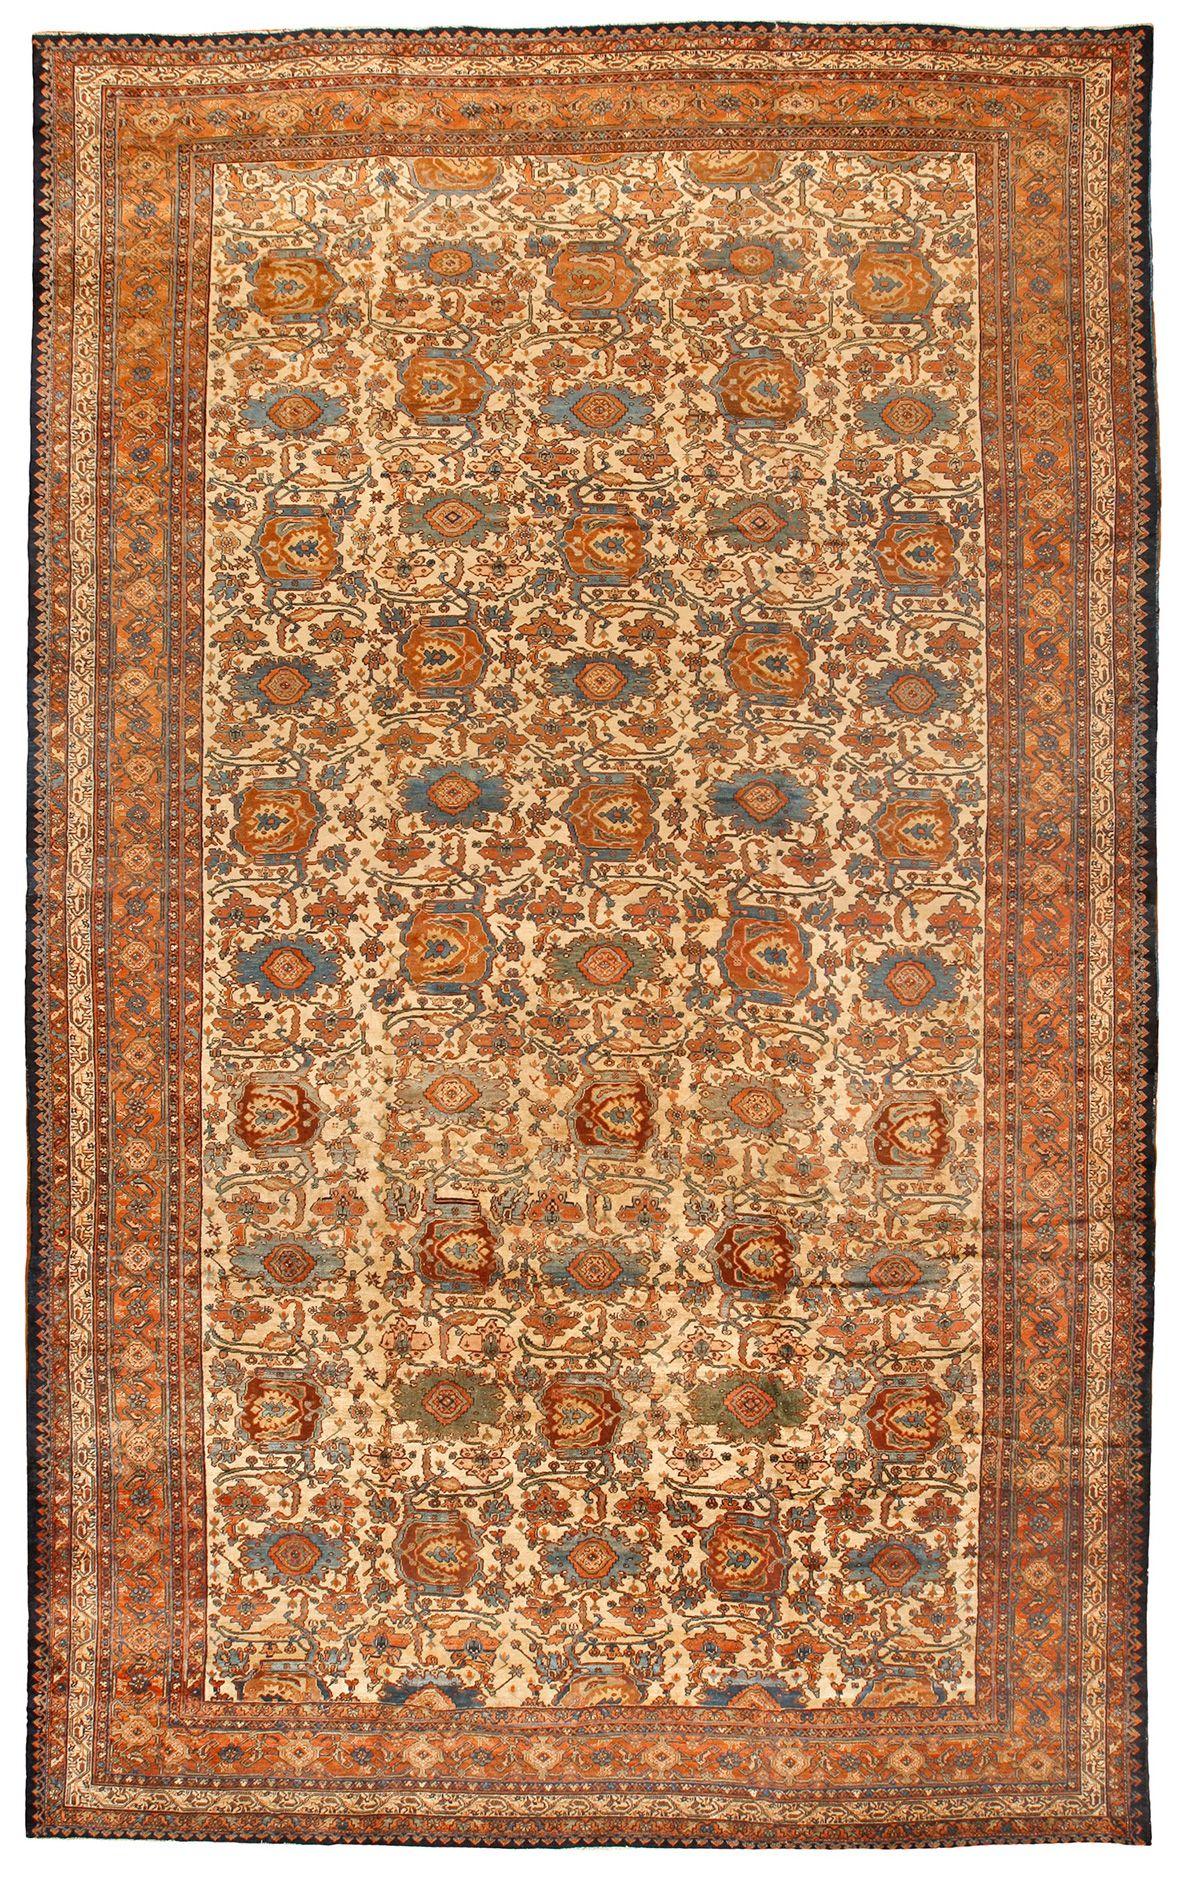 Antique Malayer Carpet 11.2 X 18.4 - Fred Moheban Gallery